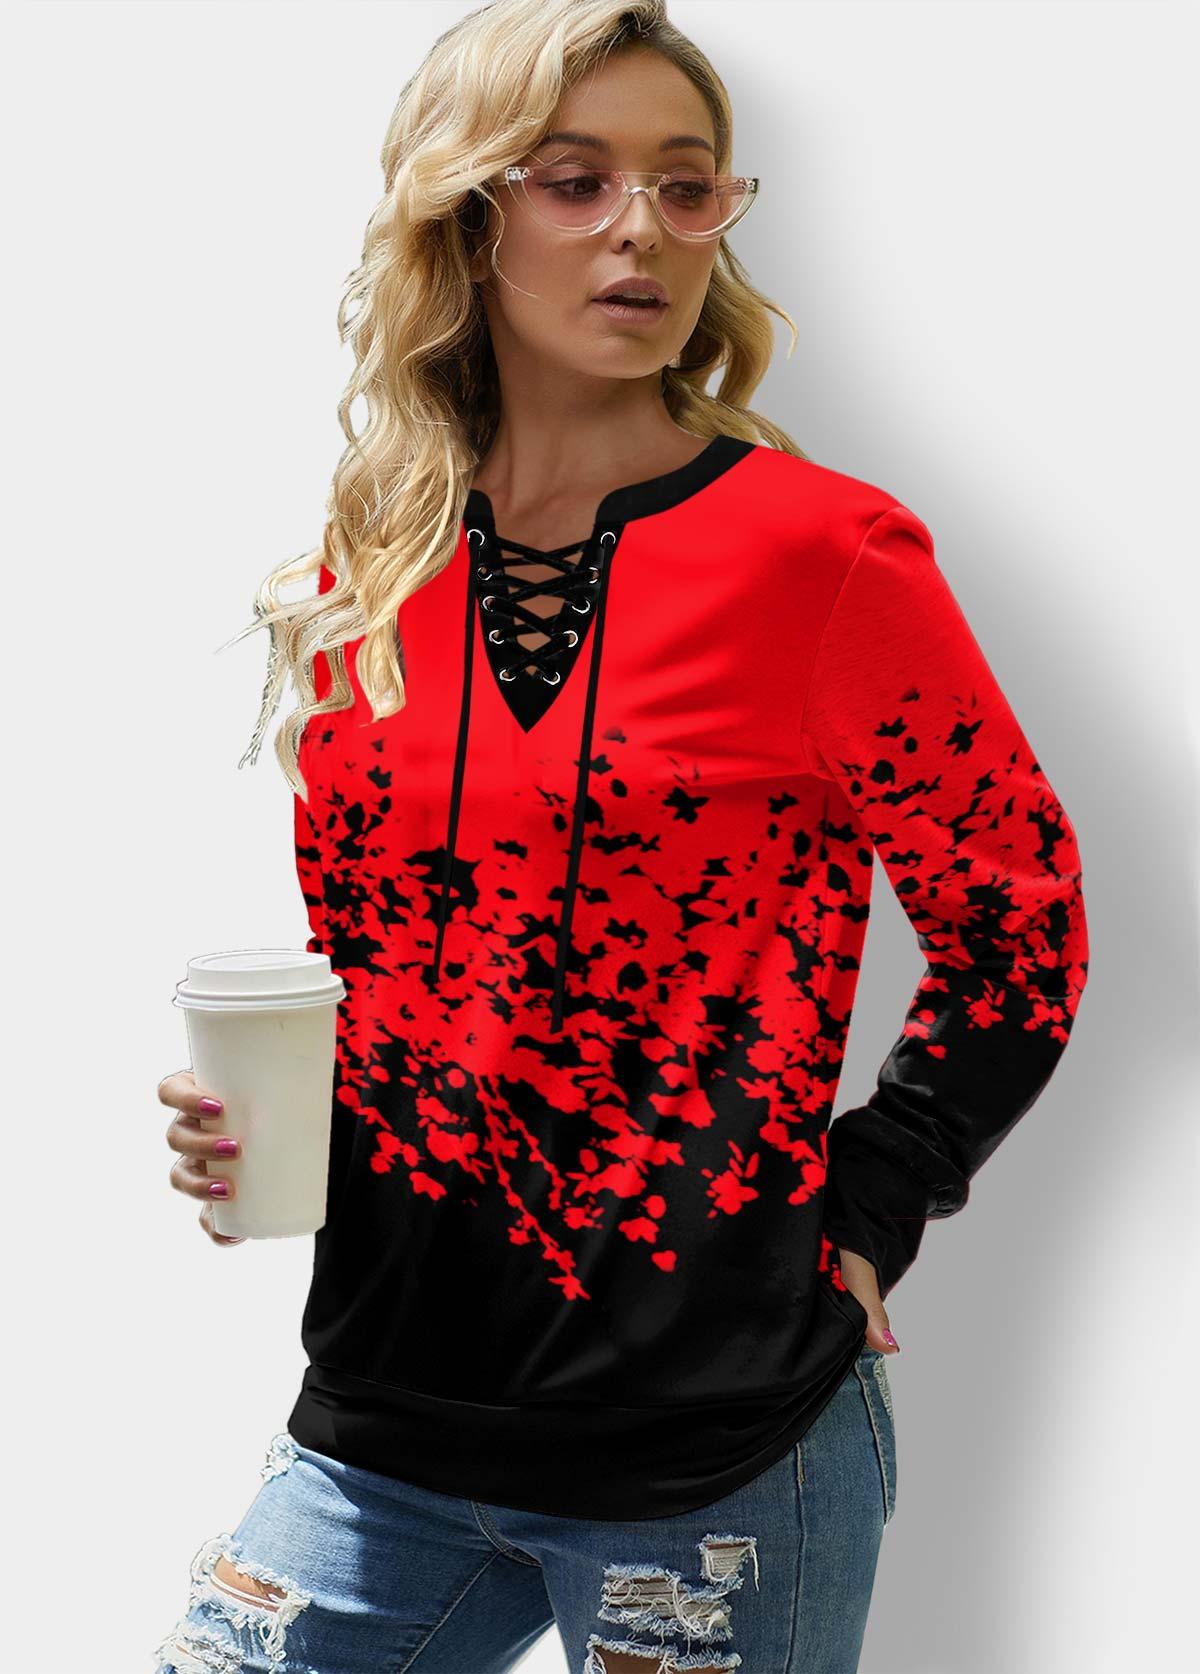 ROTITA Lace Up Long Sleeve Floral Print Sweatshirt